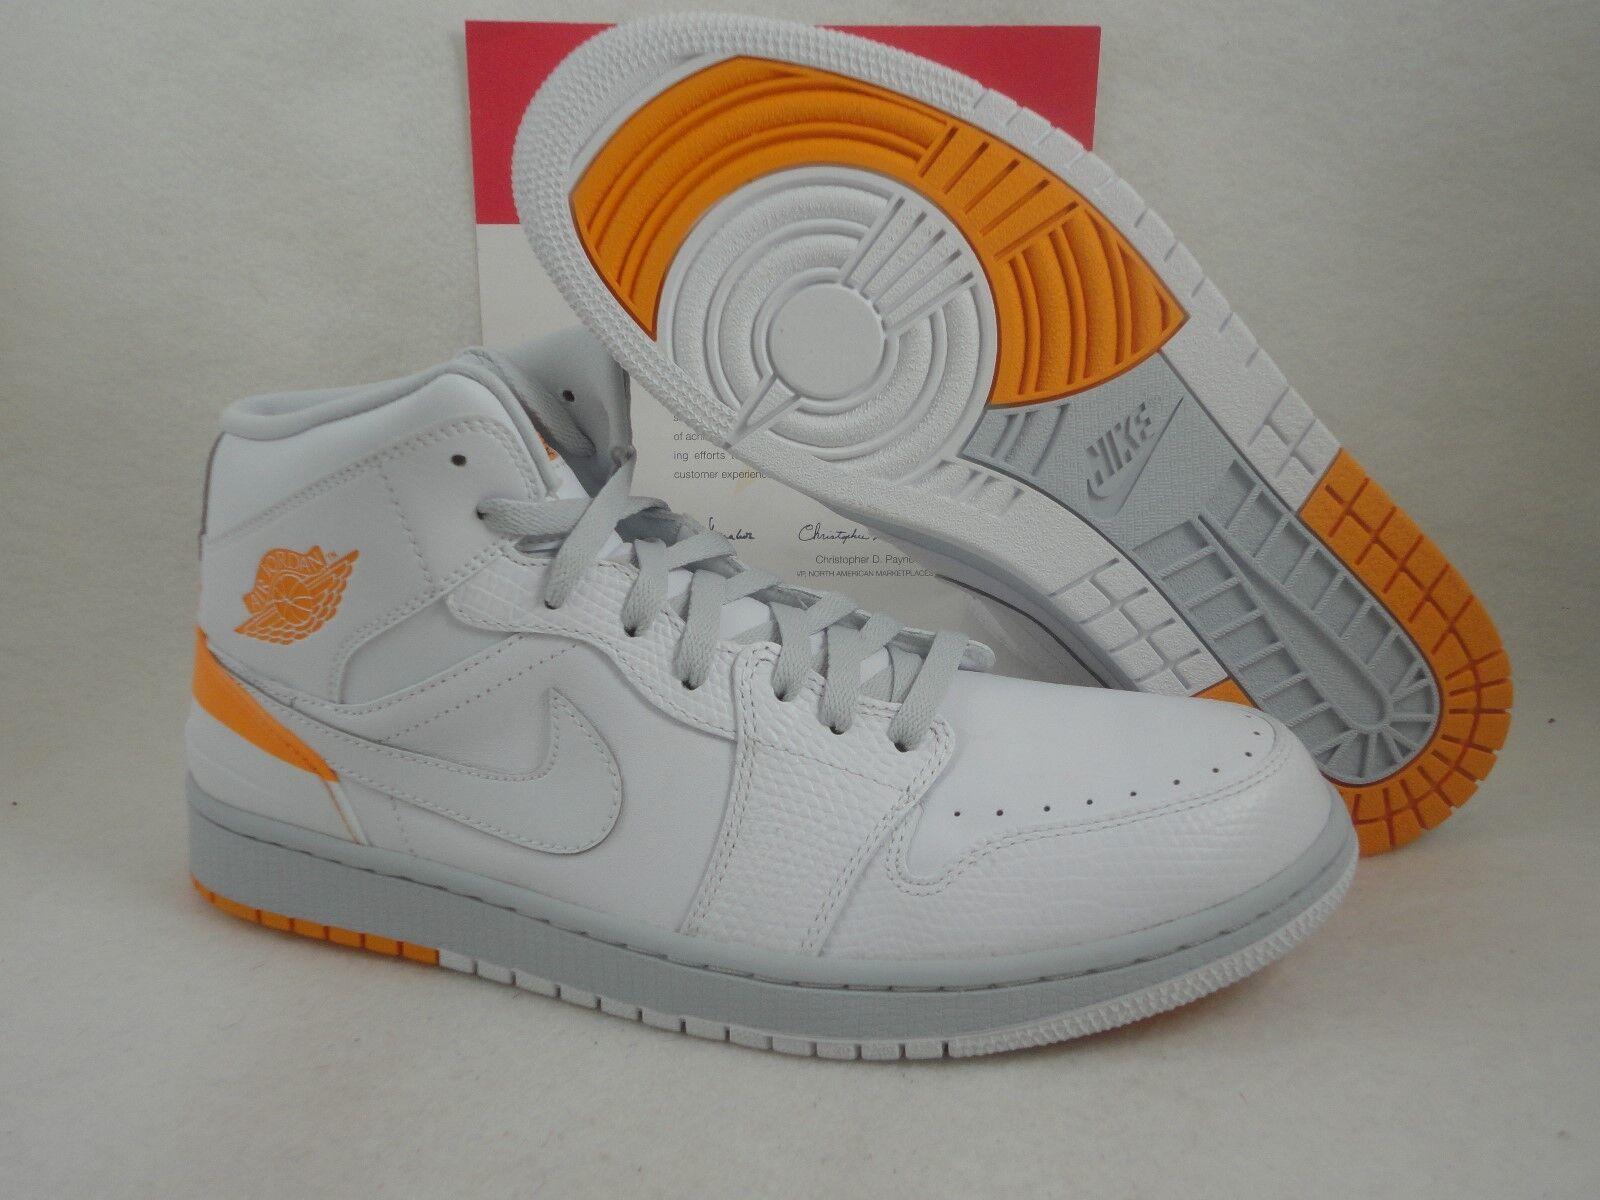 Nike Air blanco Jordan 1 retro 86, blanco Air / kumquat, 644490 115, tamaño 11,5 17b298